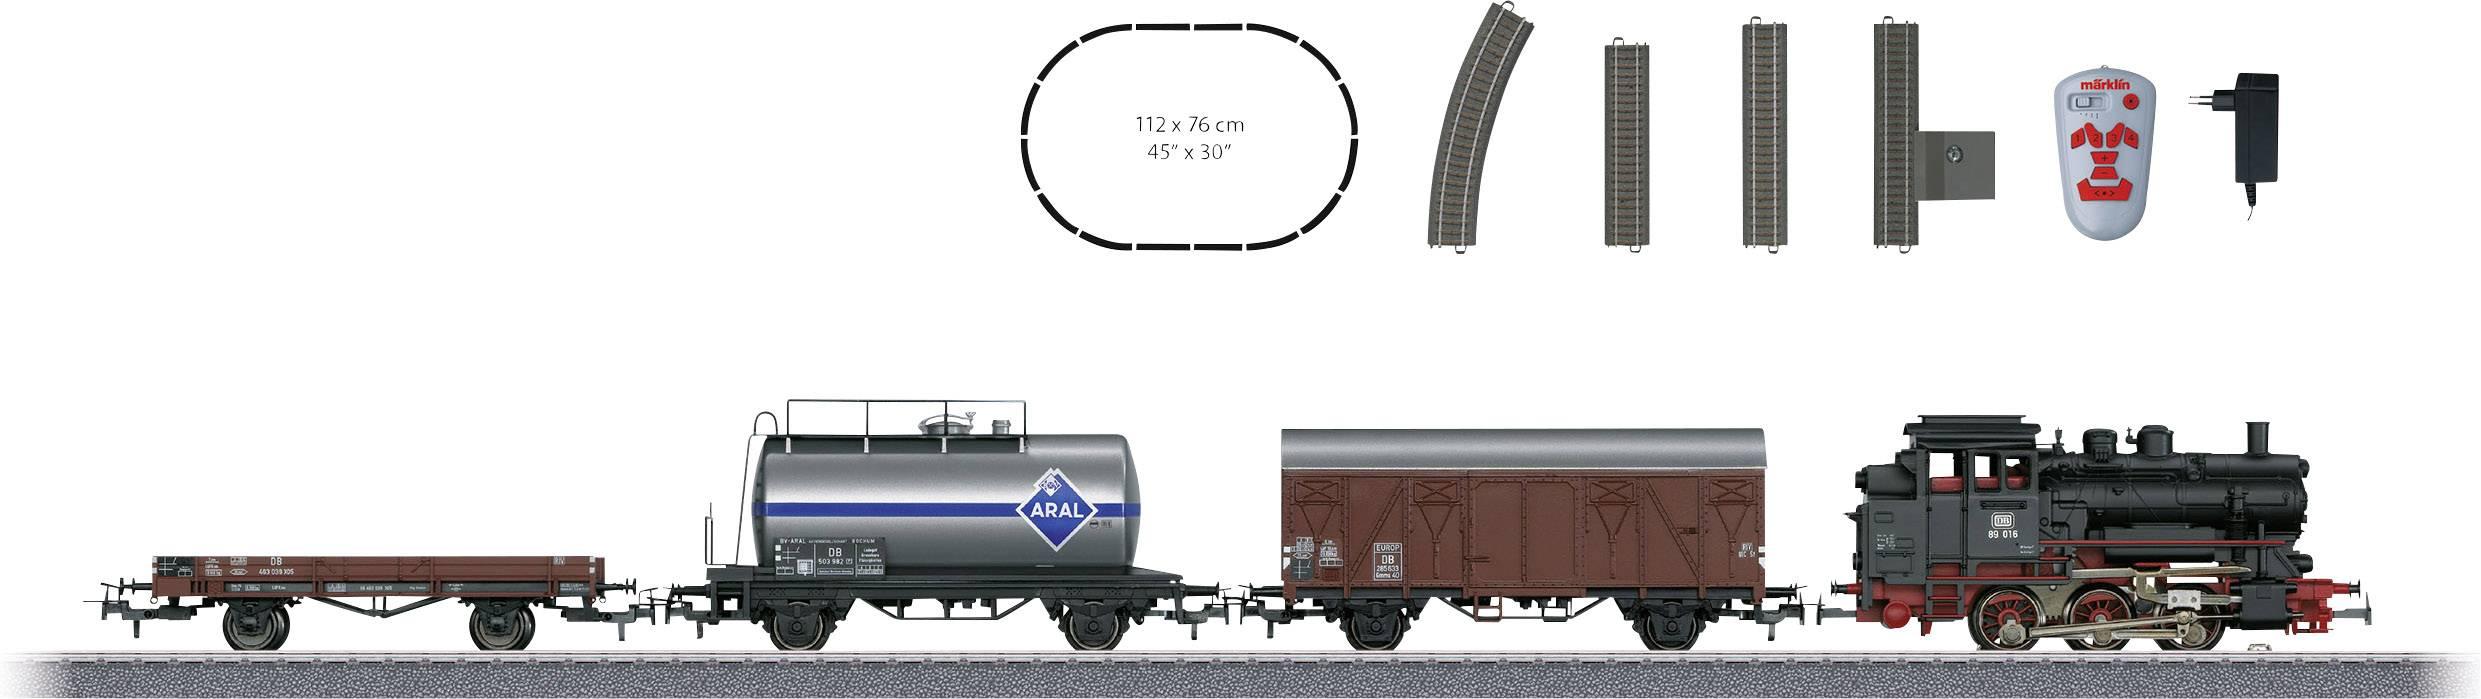 Nákladný vlak s vagónmi a parnou lokomotívou Märklin Start up 29323